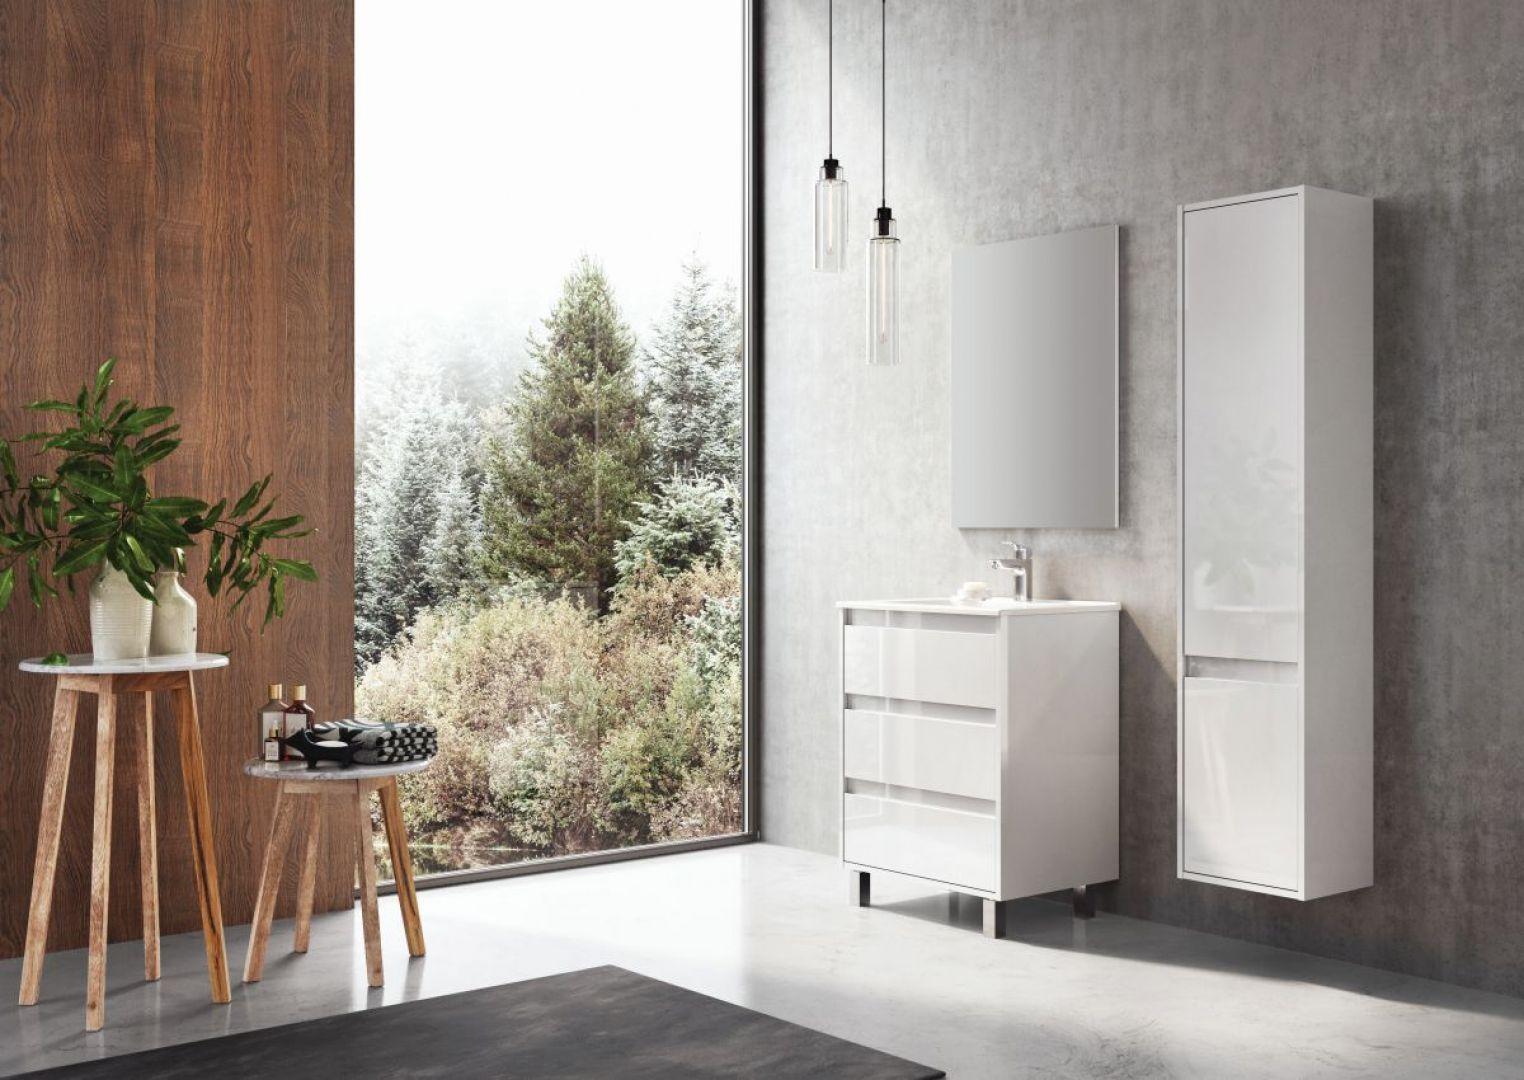 Nowoczesne meble łazienkowe z serii Desi Plus marki Elita. Fot. Elita